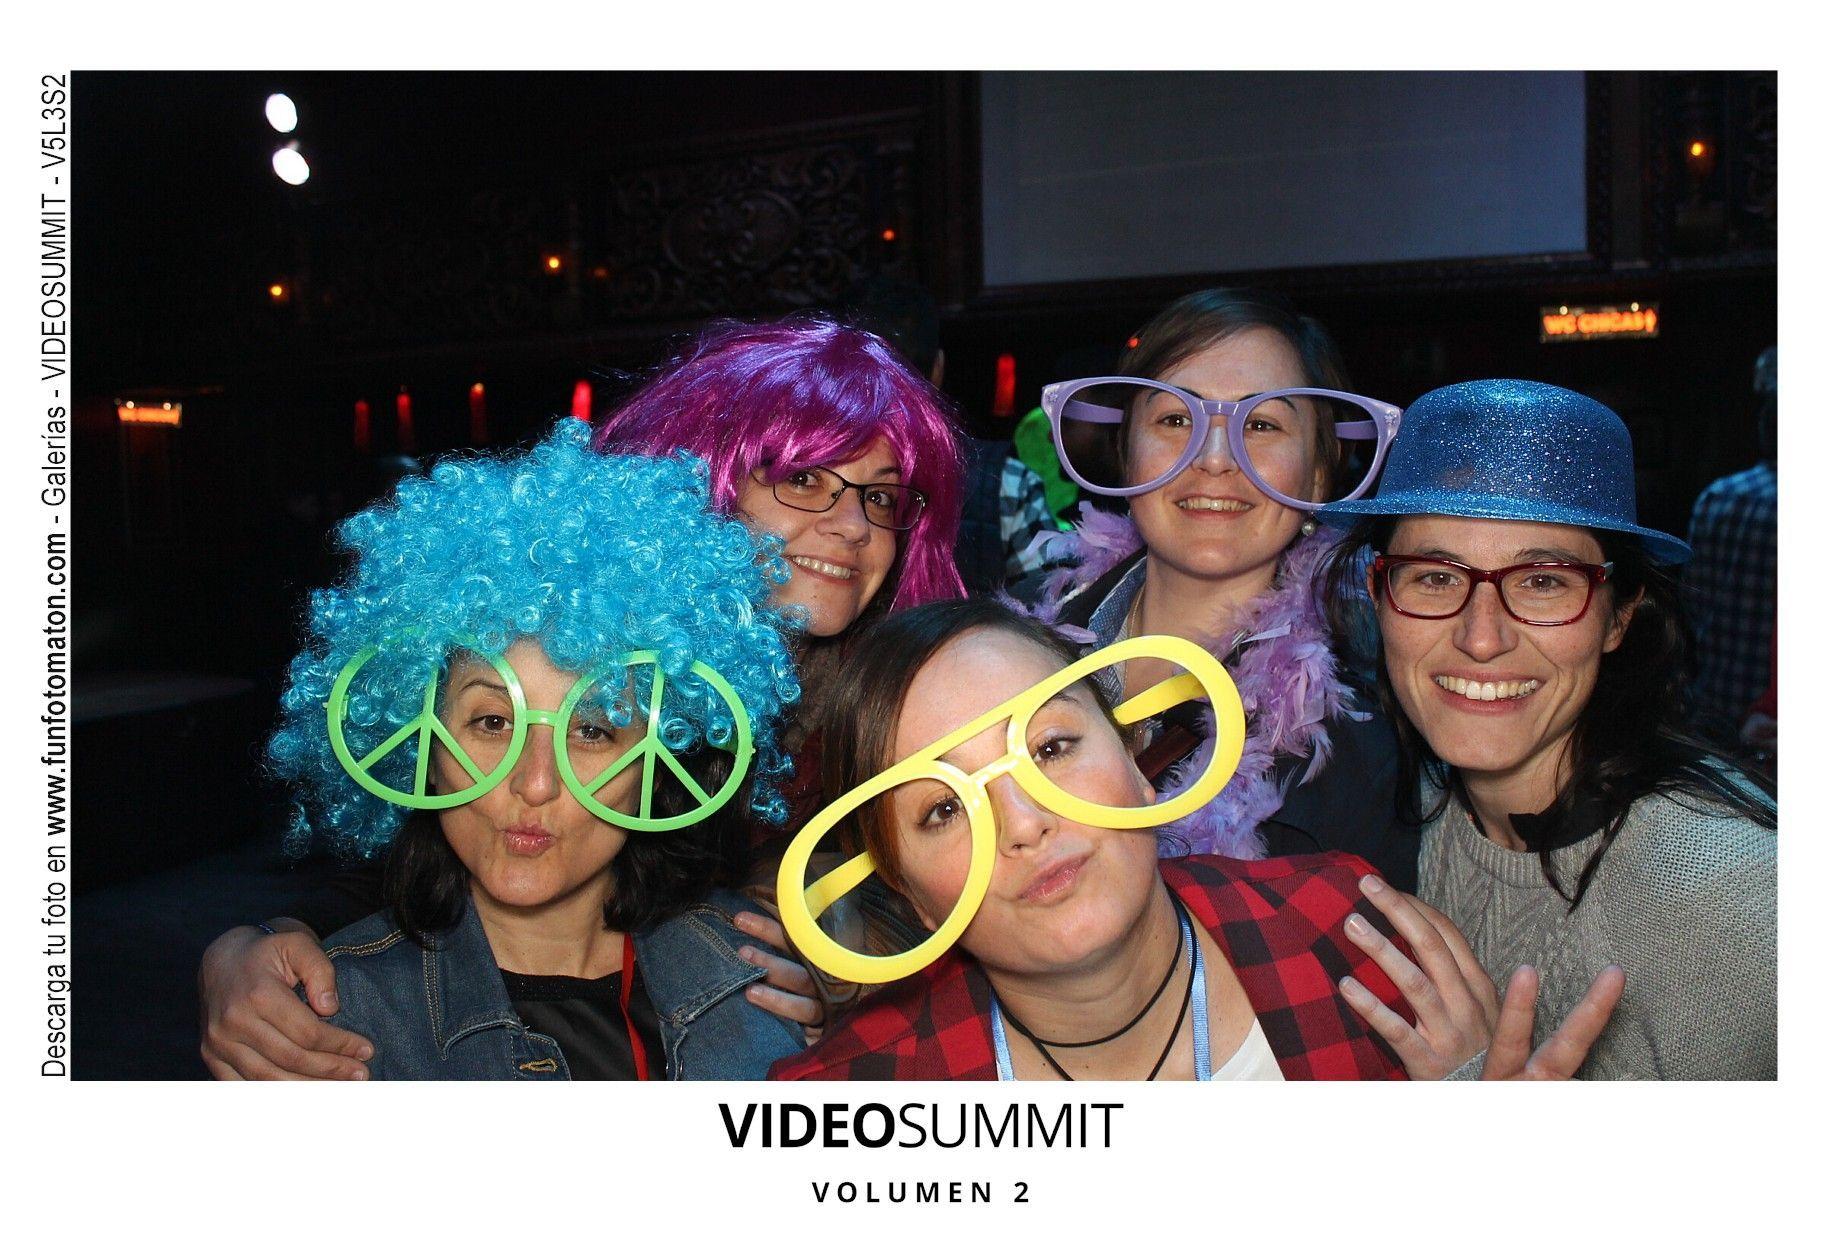 videosummit-vol2-club-party-057